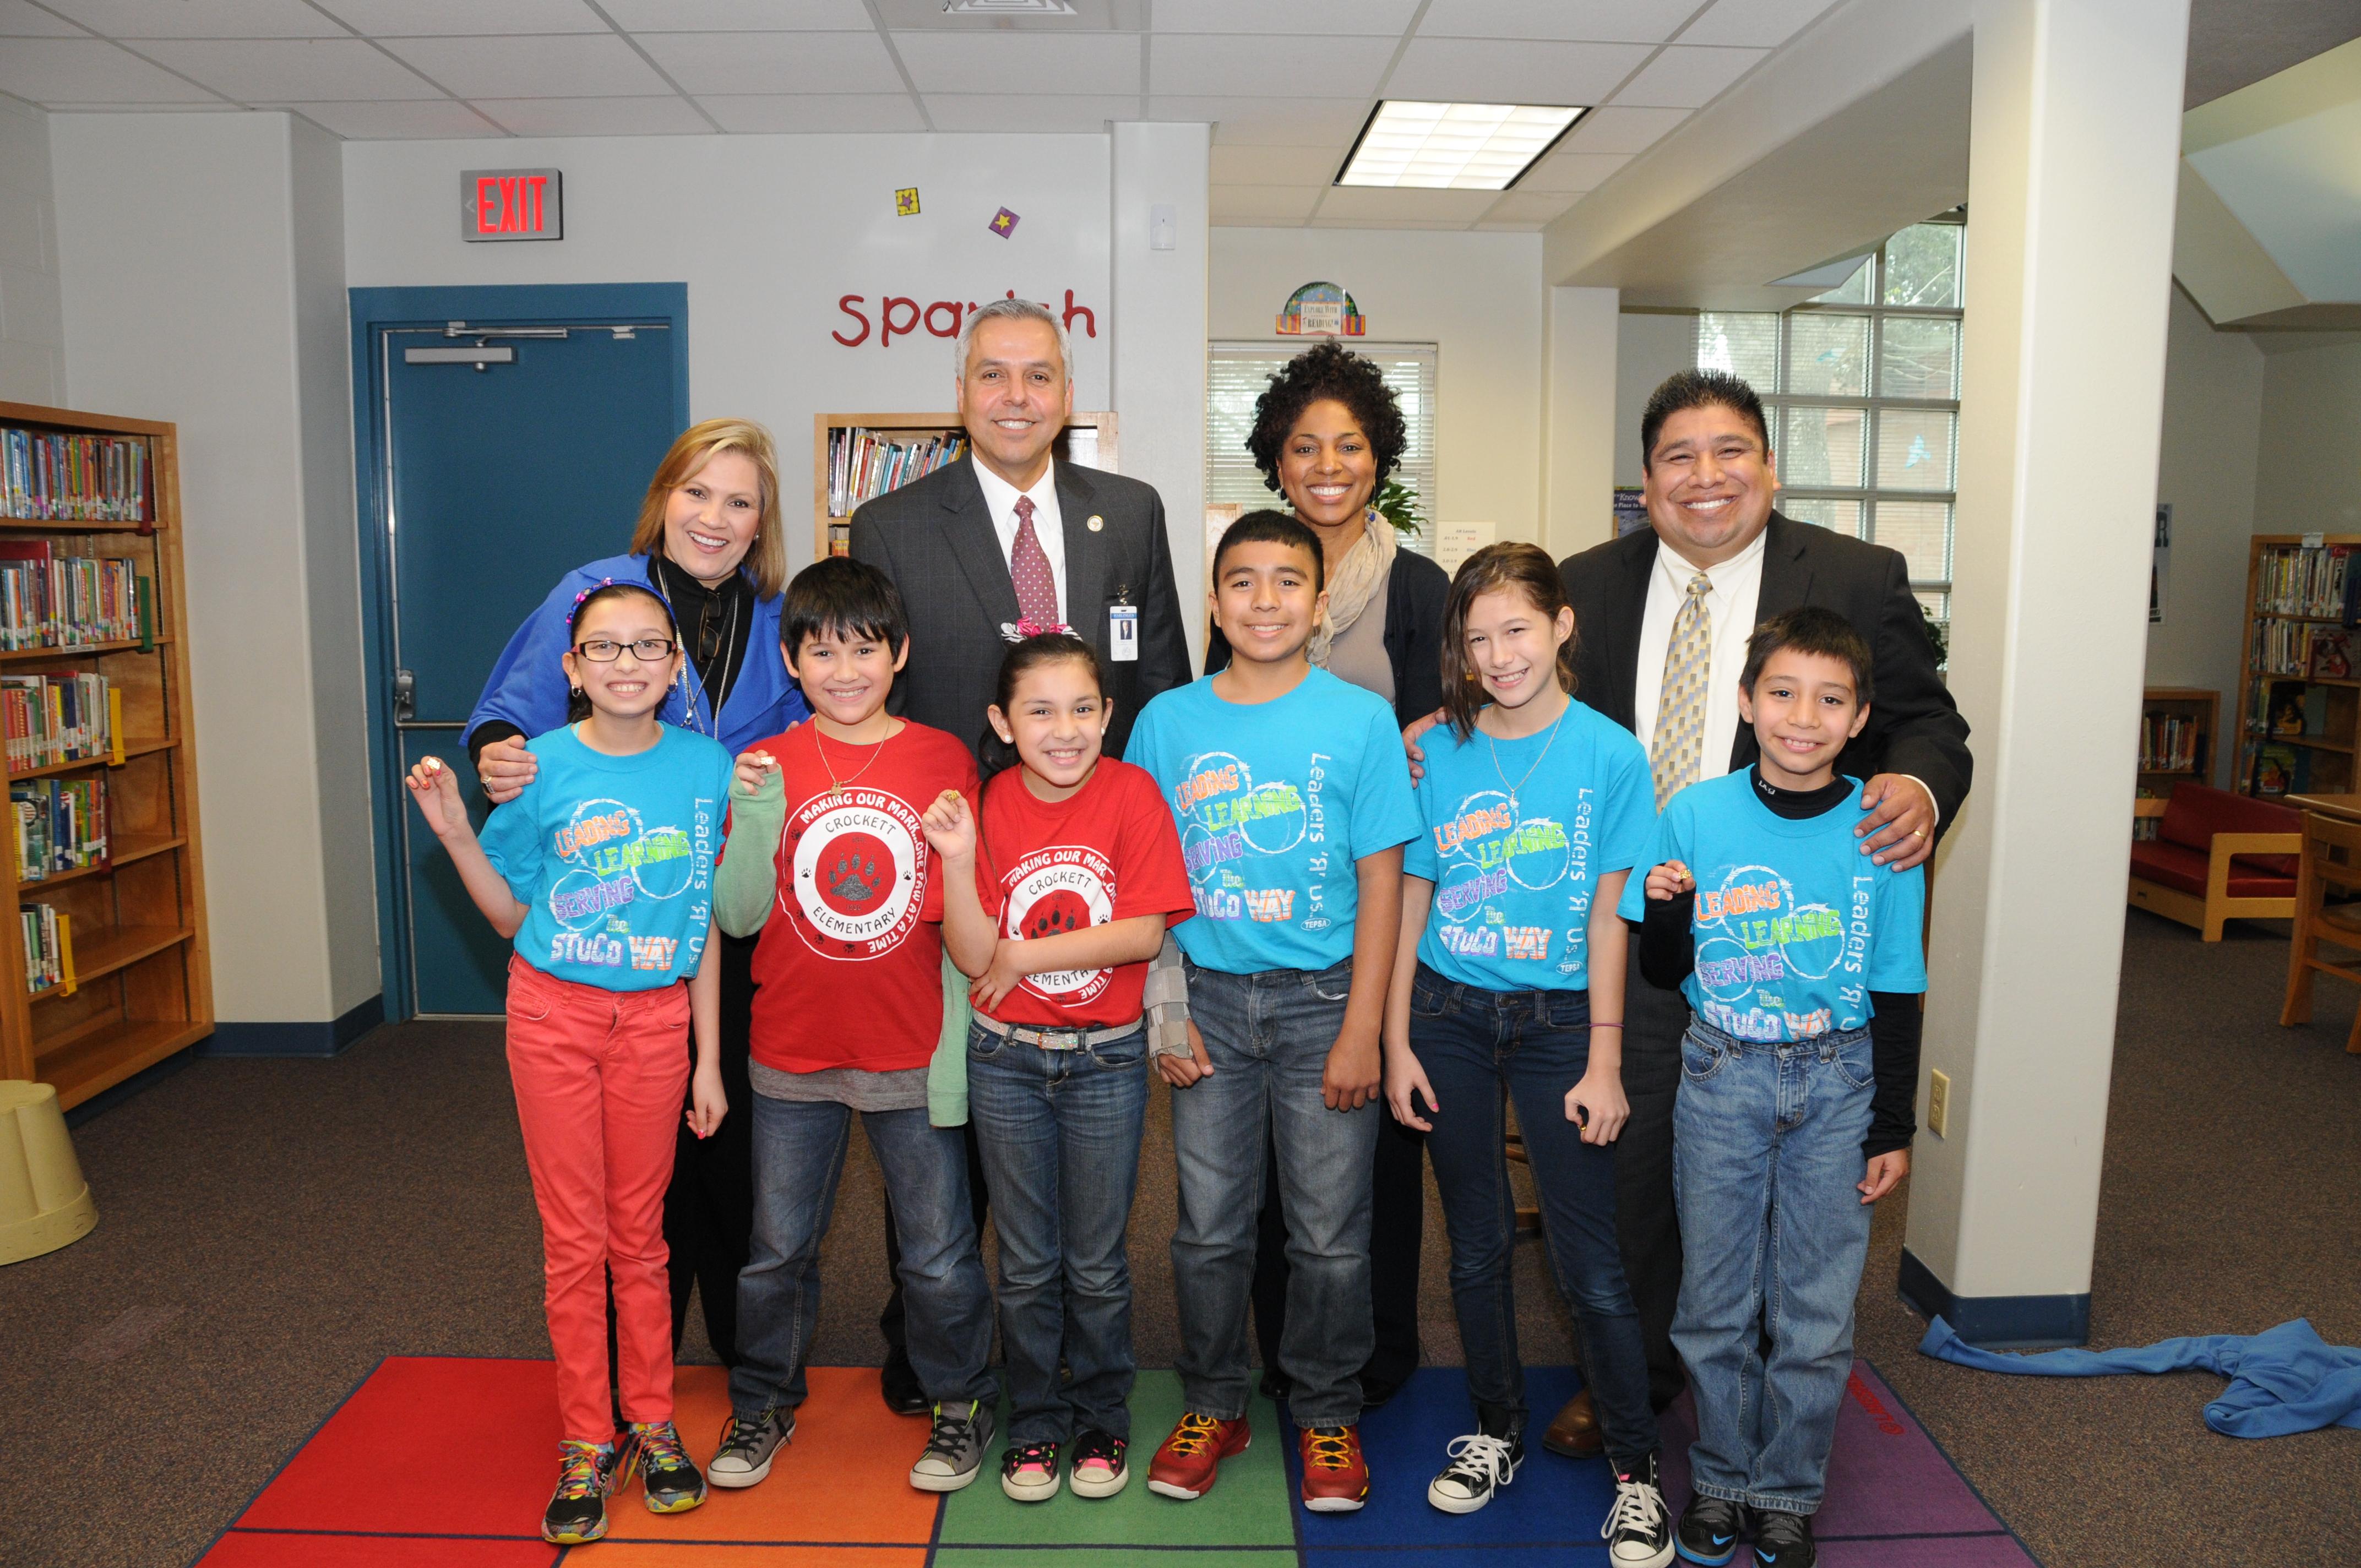 HCISD celebrates National Library Week 2014